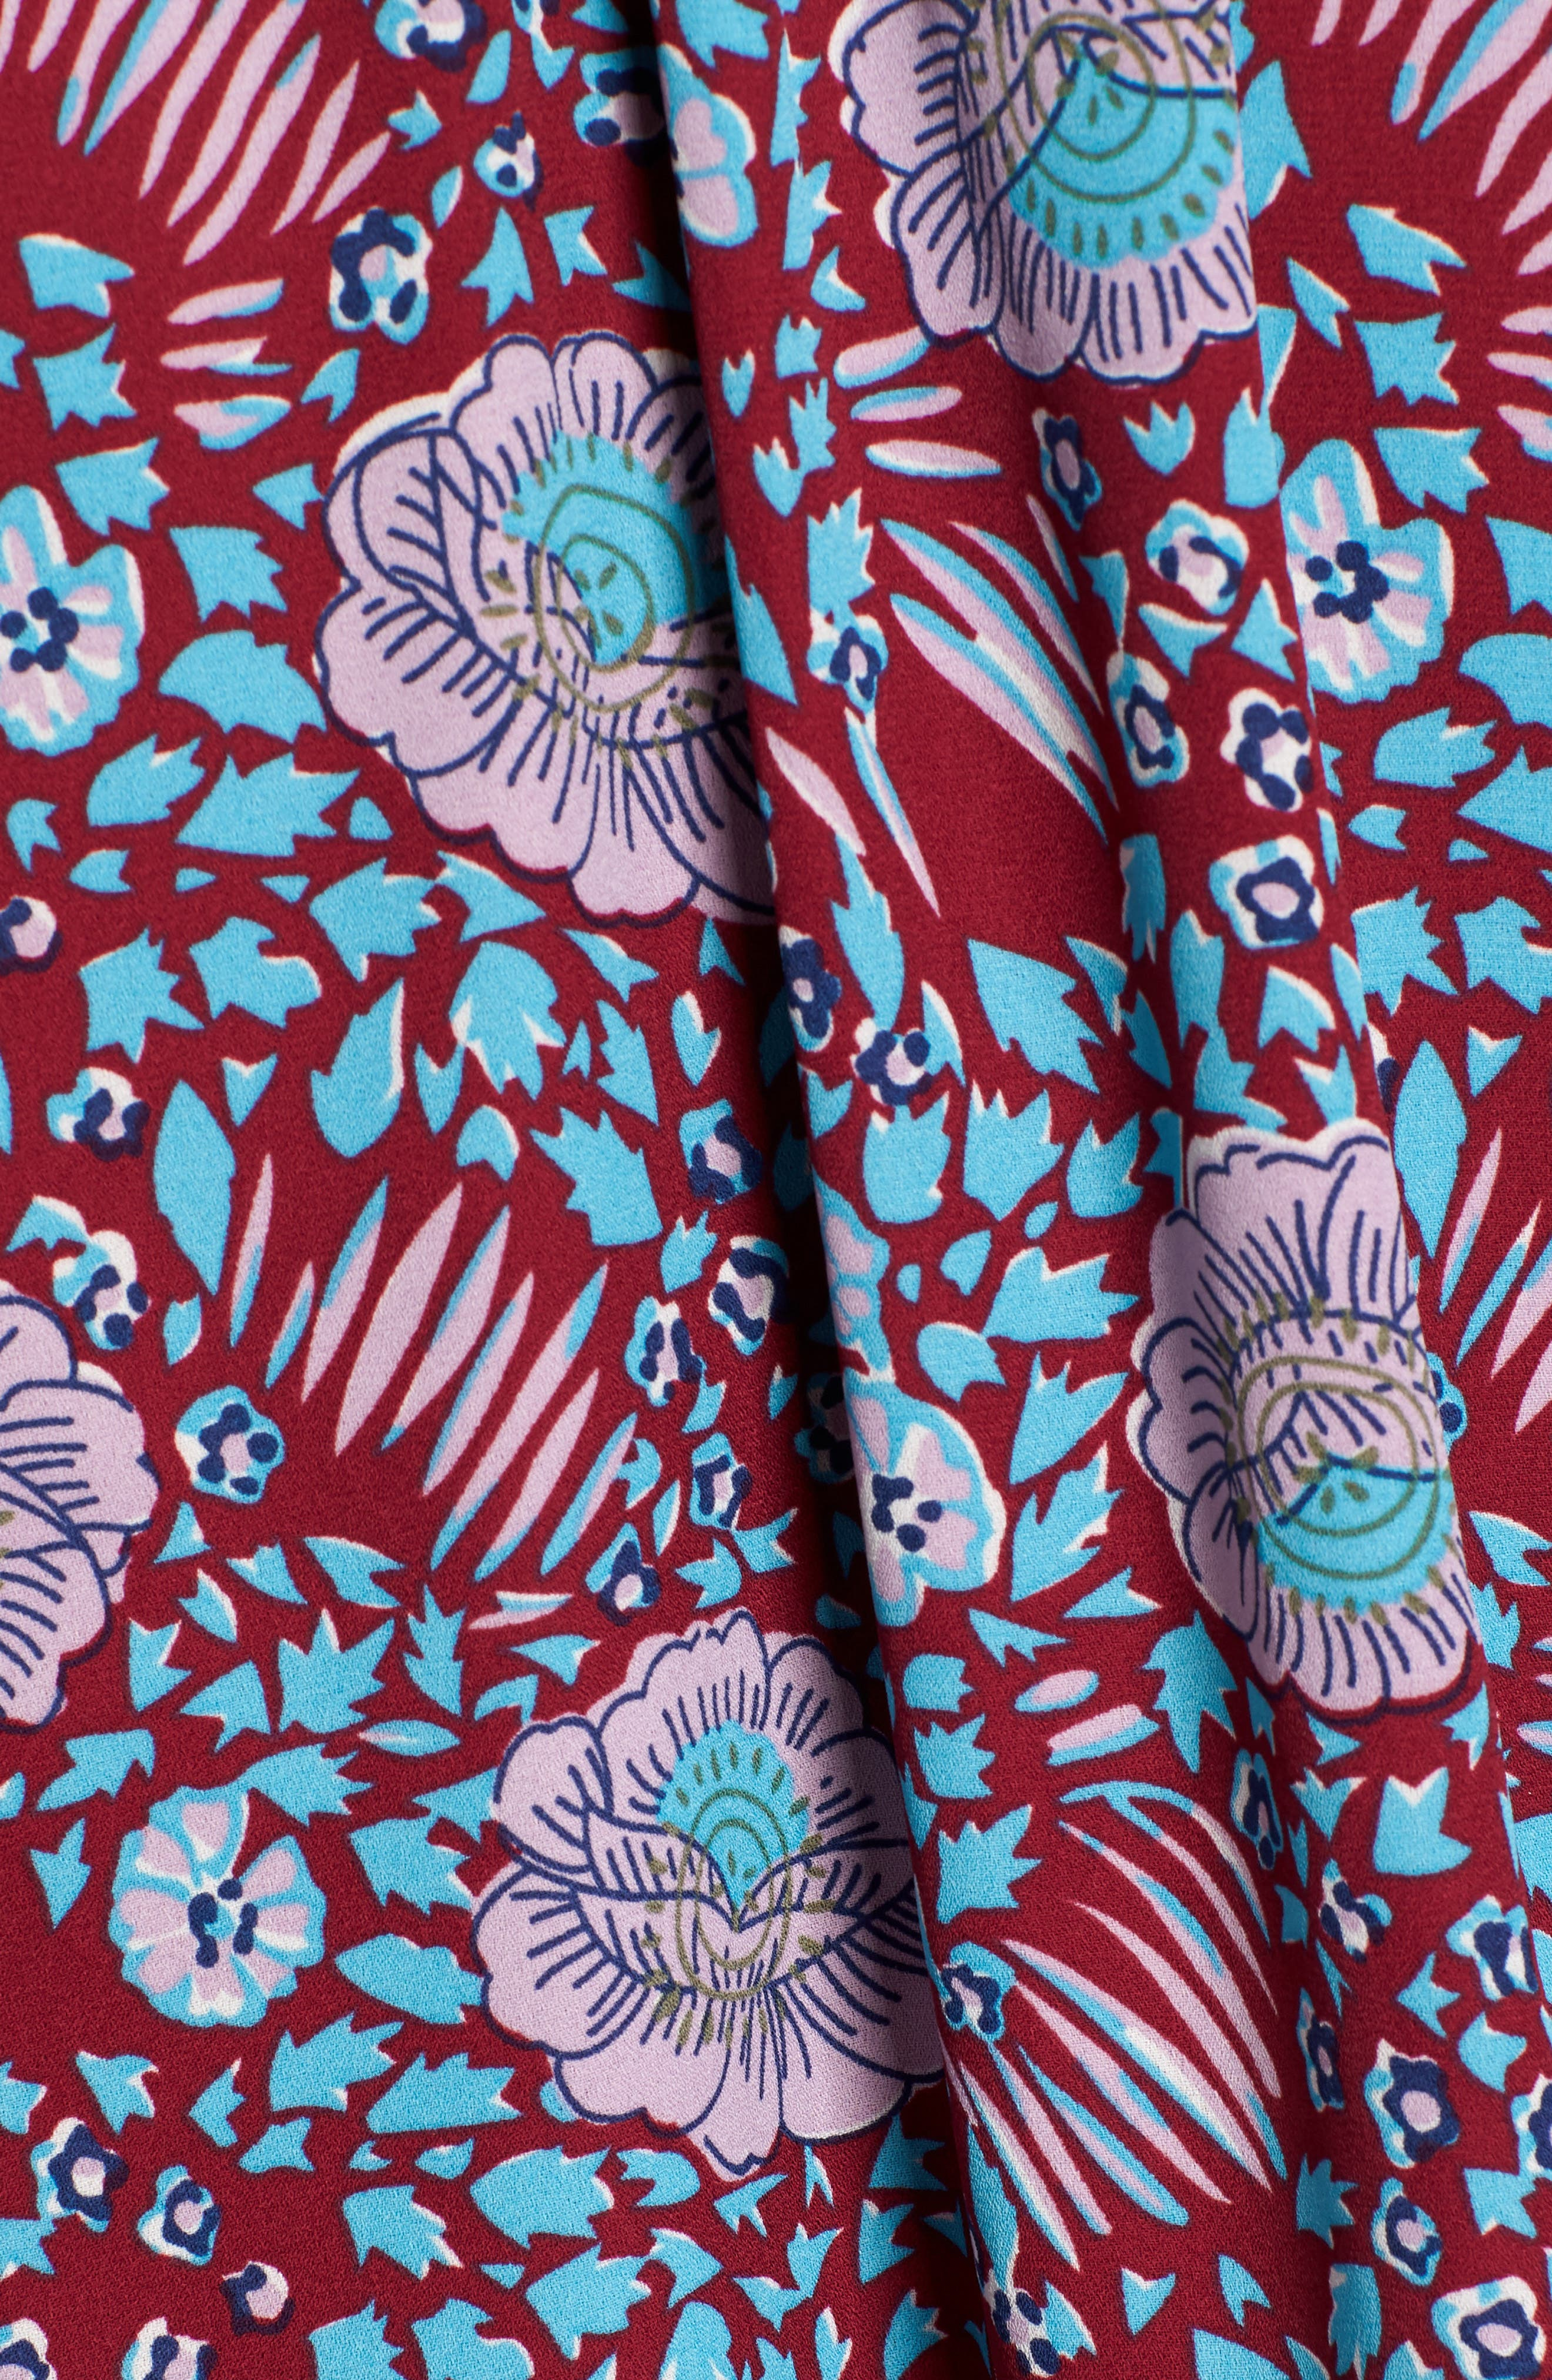 Penelope Floral Ruffle Top,                             Alternate thumbnail 5, color,                             DARK RED MULTI